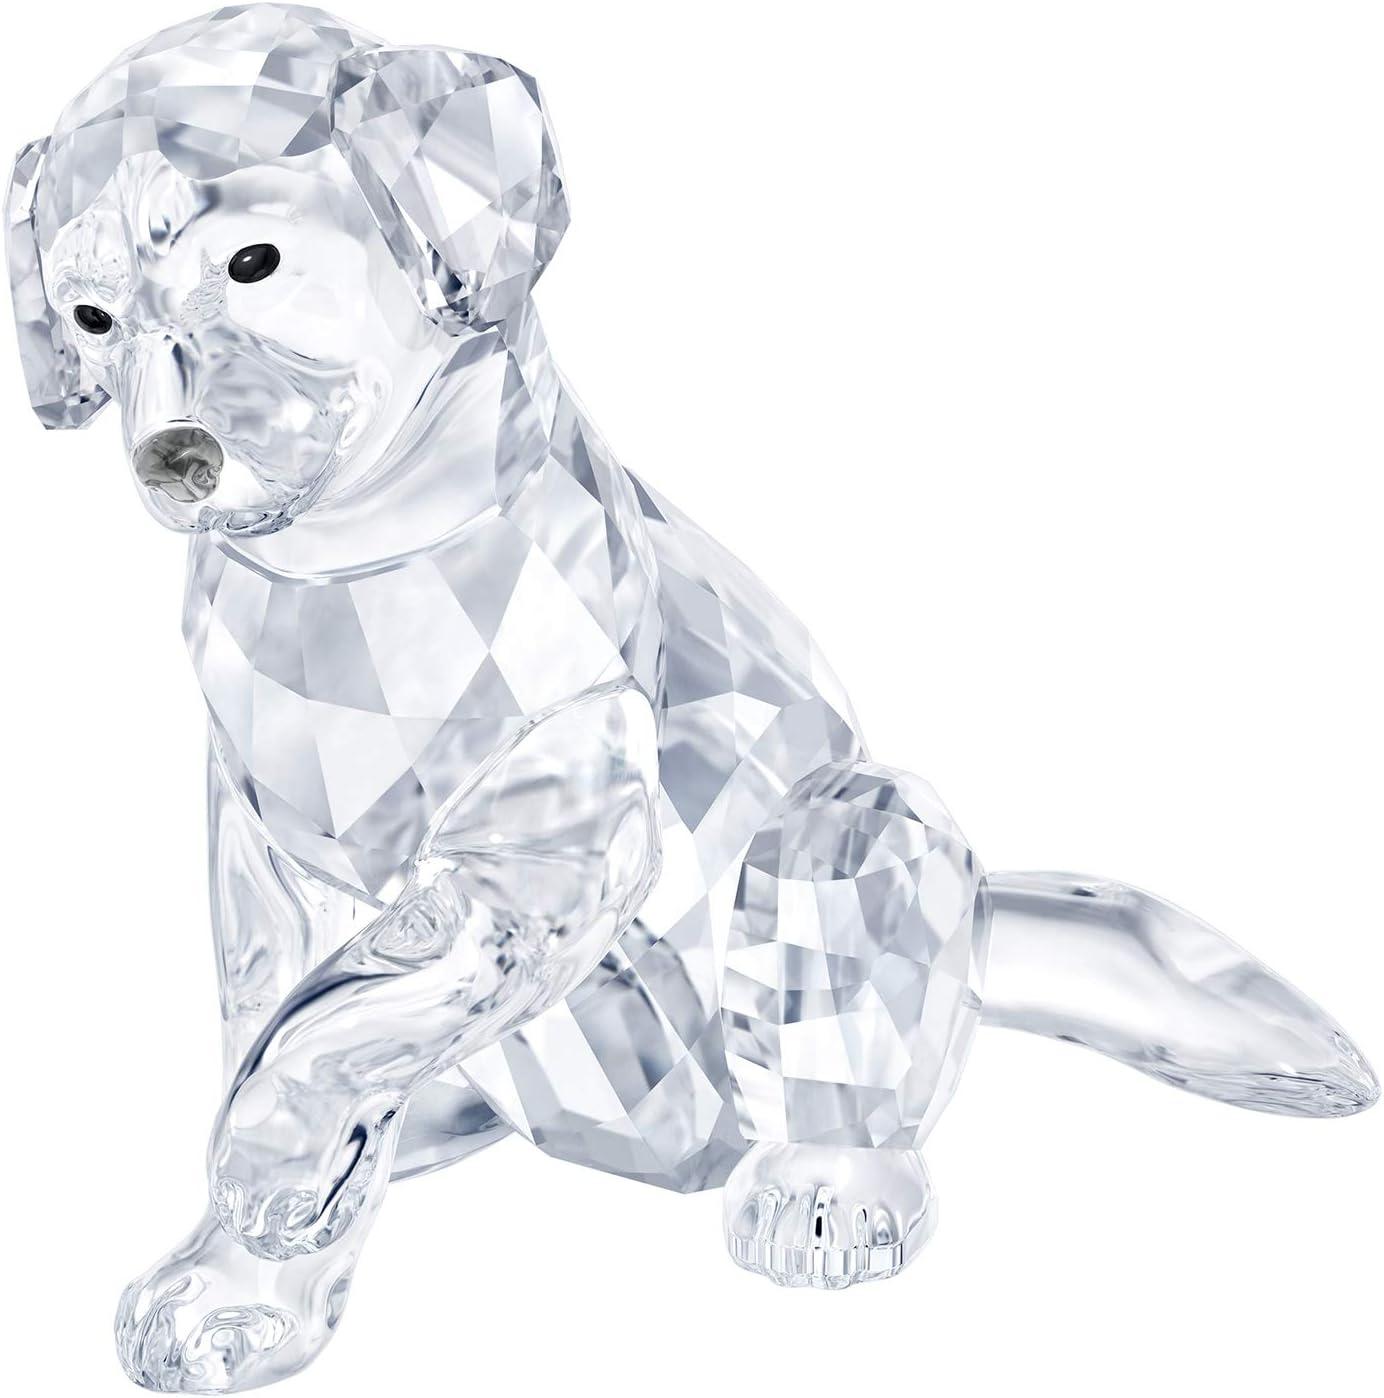 SWAROVSKI Labrador Mother, Crystal, Transparent, 6.1 x 6.8 x 4.2 cm